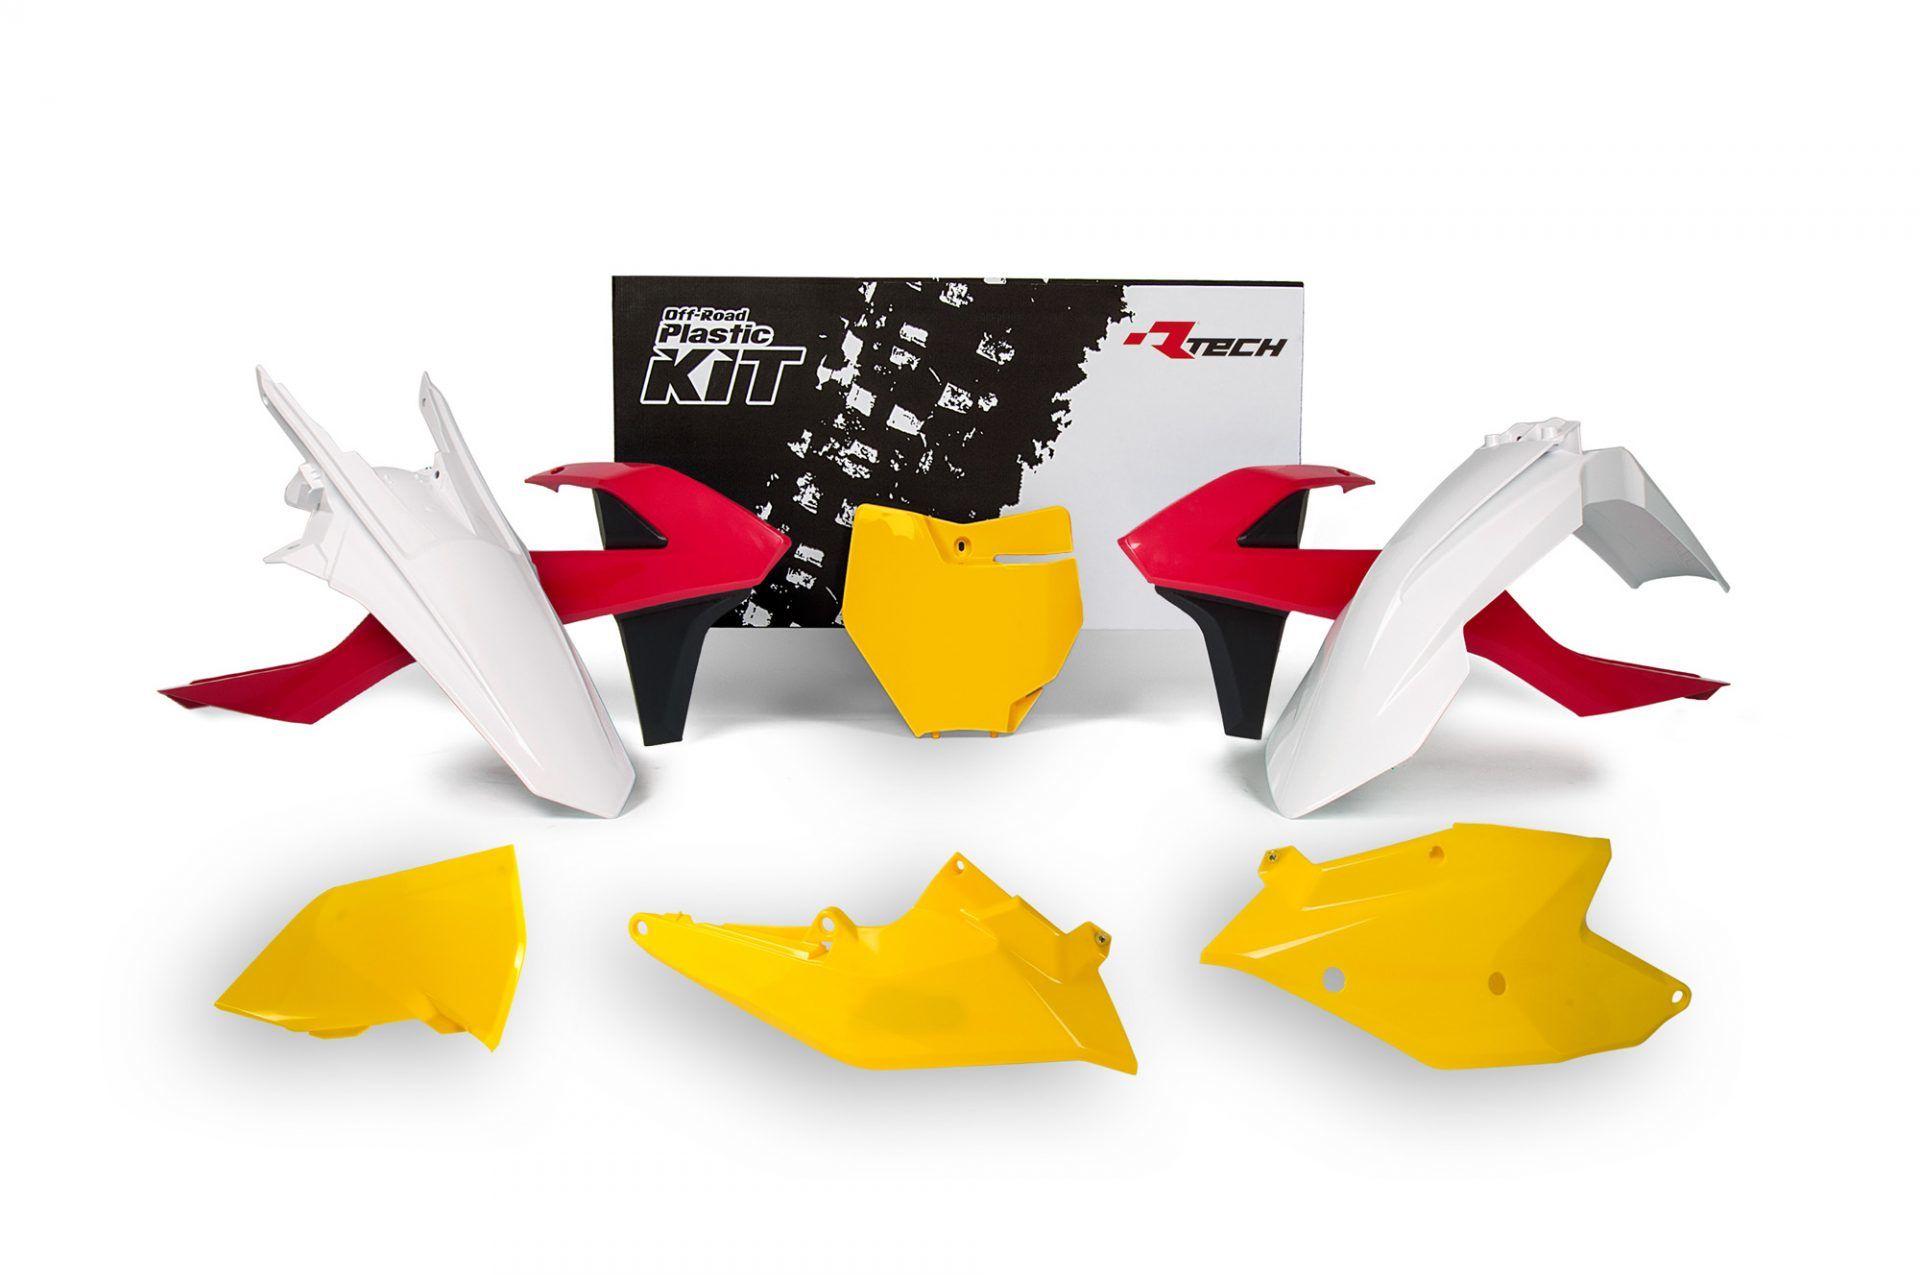 Neon yellow kit rival ink design co custom motocross graphics - Rtech Ktm Sx Sxf 2016 18 Vintage Red Yellow Plastics Kit